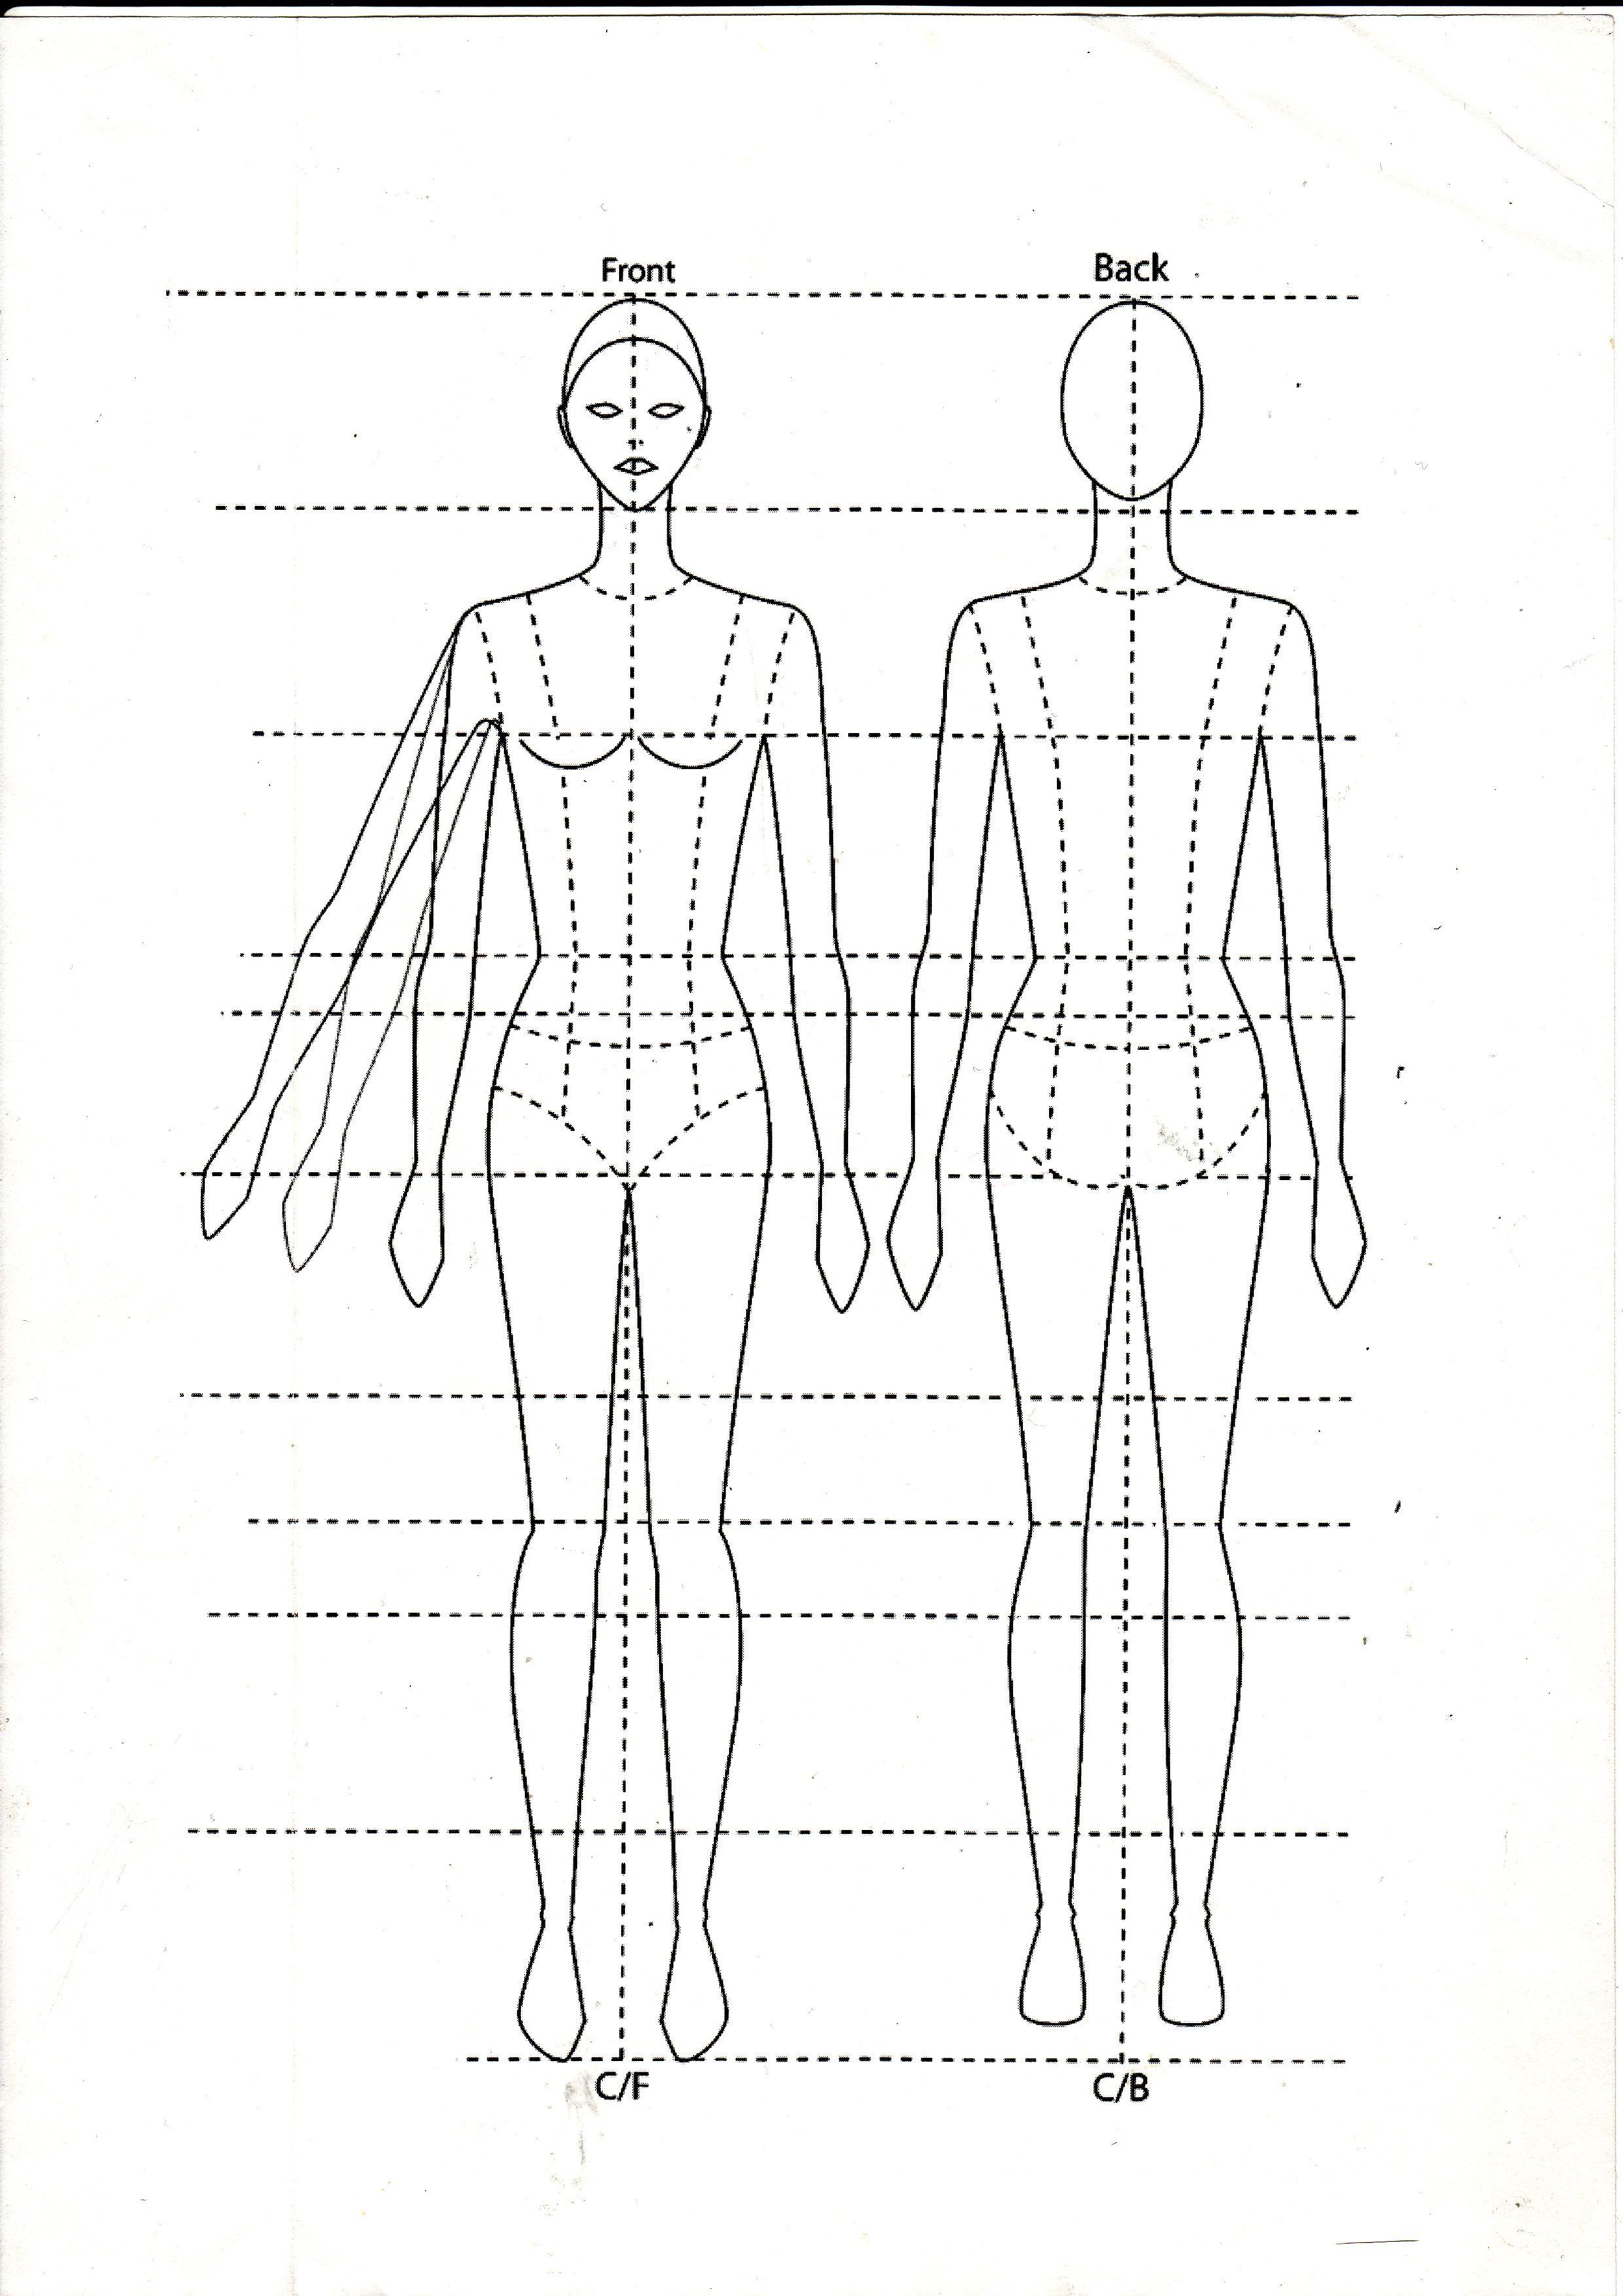 Tops fashion design sketches flat fashion sketch top 045 - Basic Fashion Template Figure